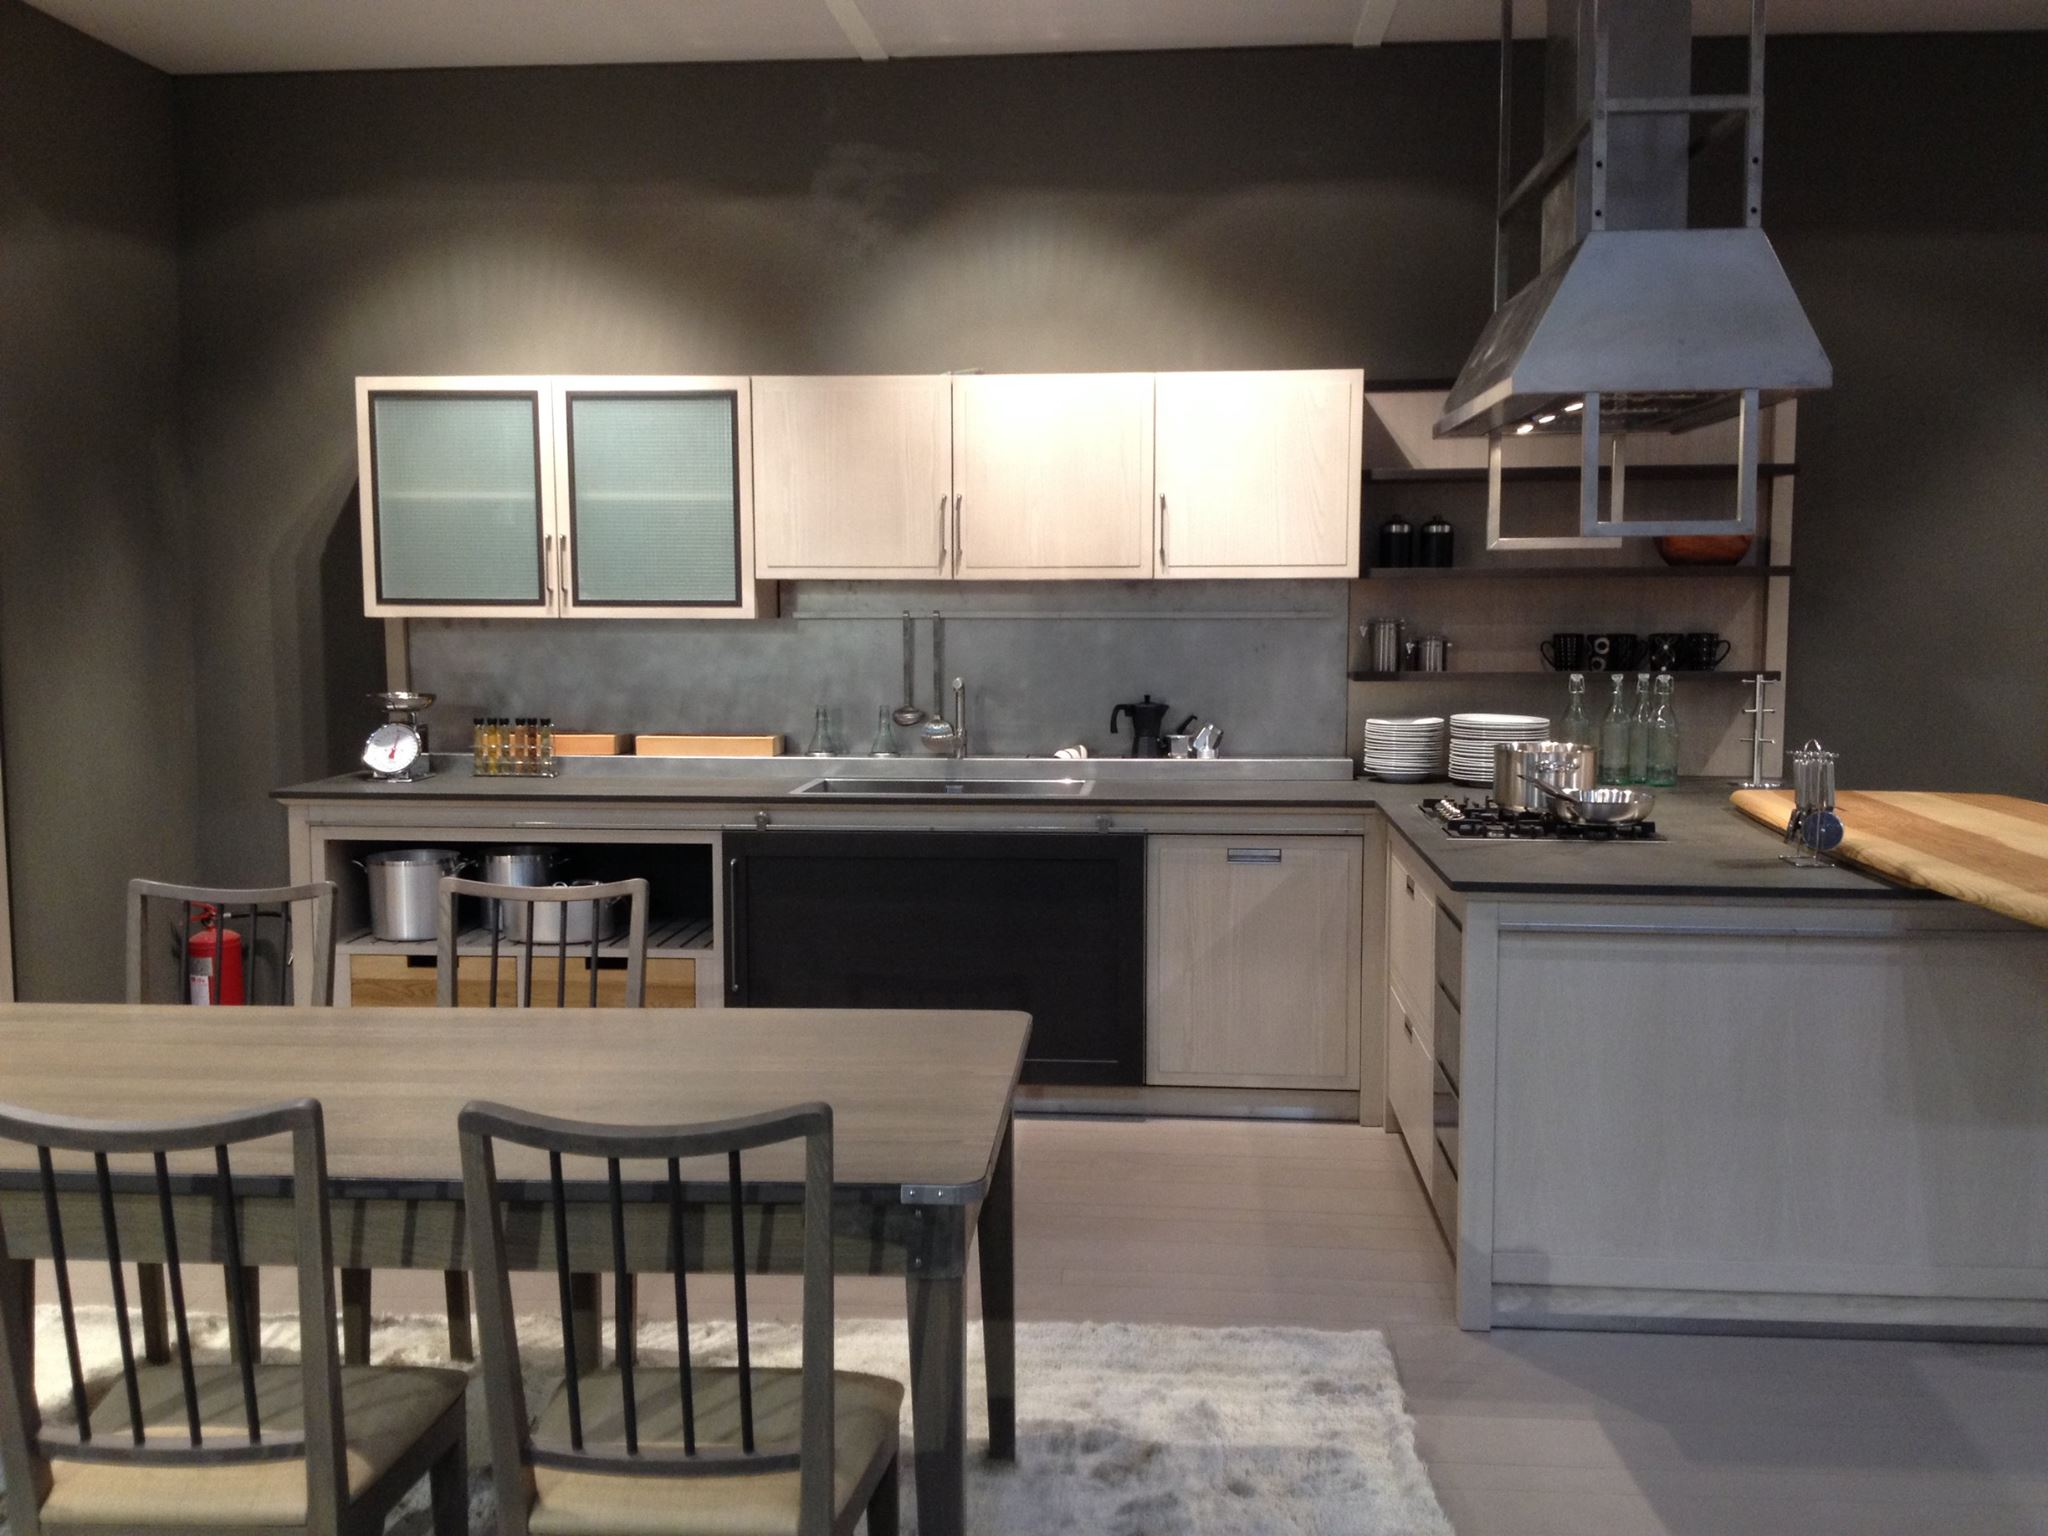 Cucine Industrial Chic L\'Ottocento | Tetesi Arredamenti